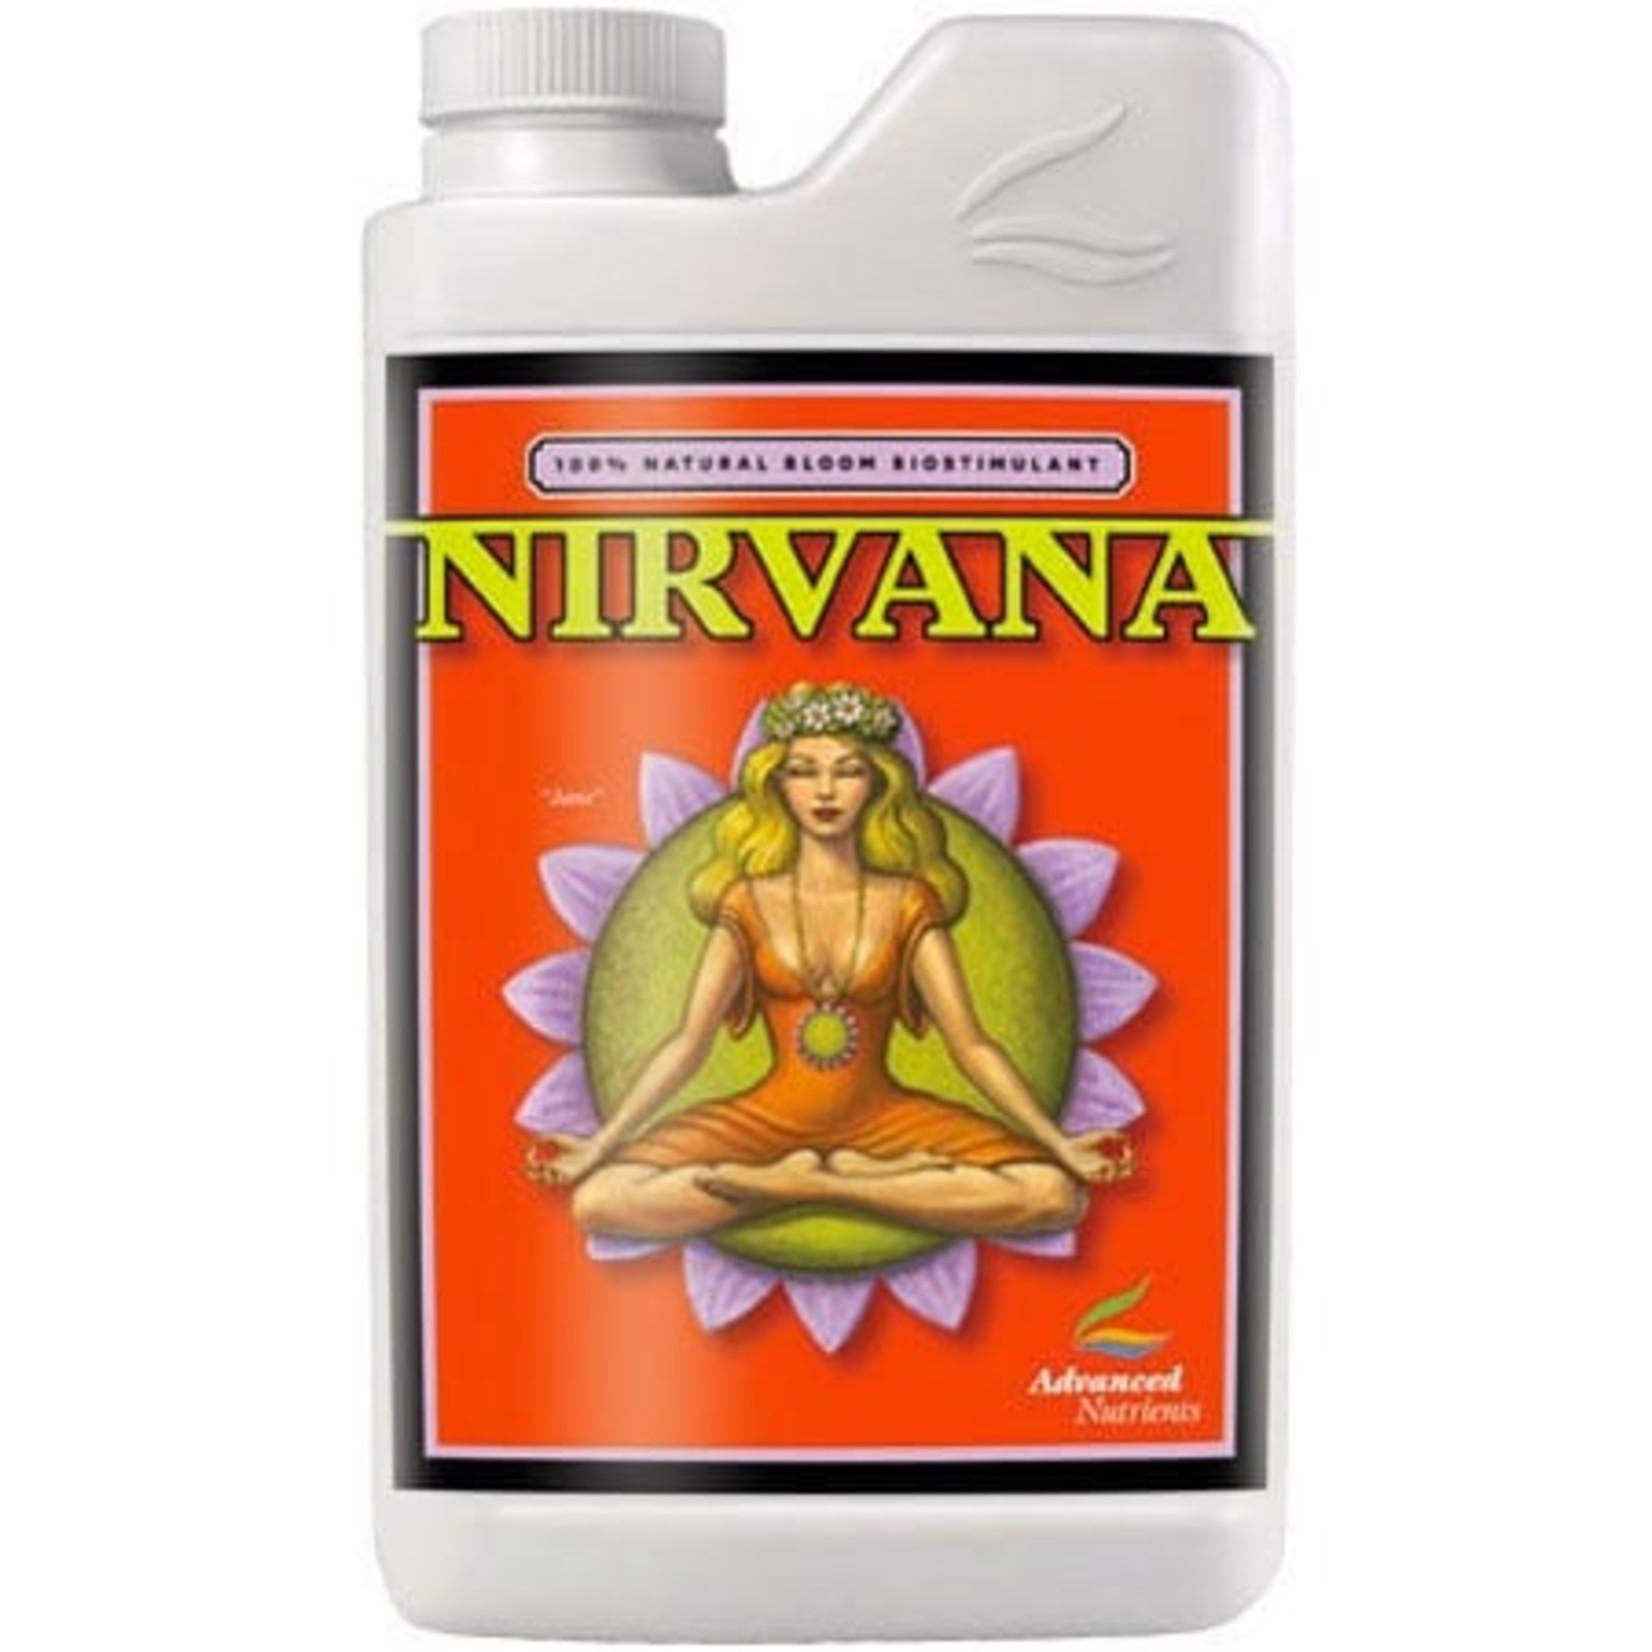 Advanced Nutrients ADVANCED NUTRIENTS NIRVANA 1L